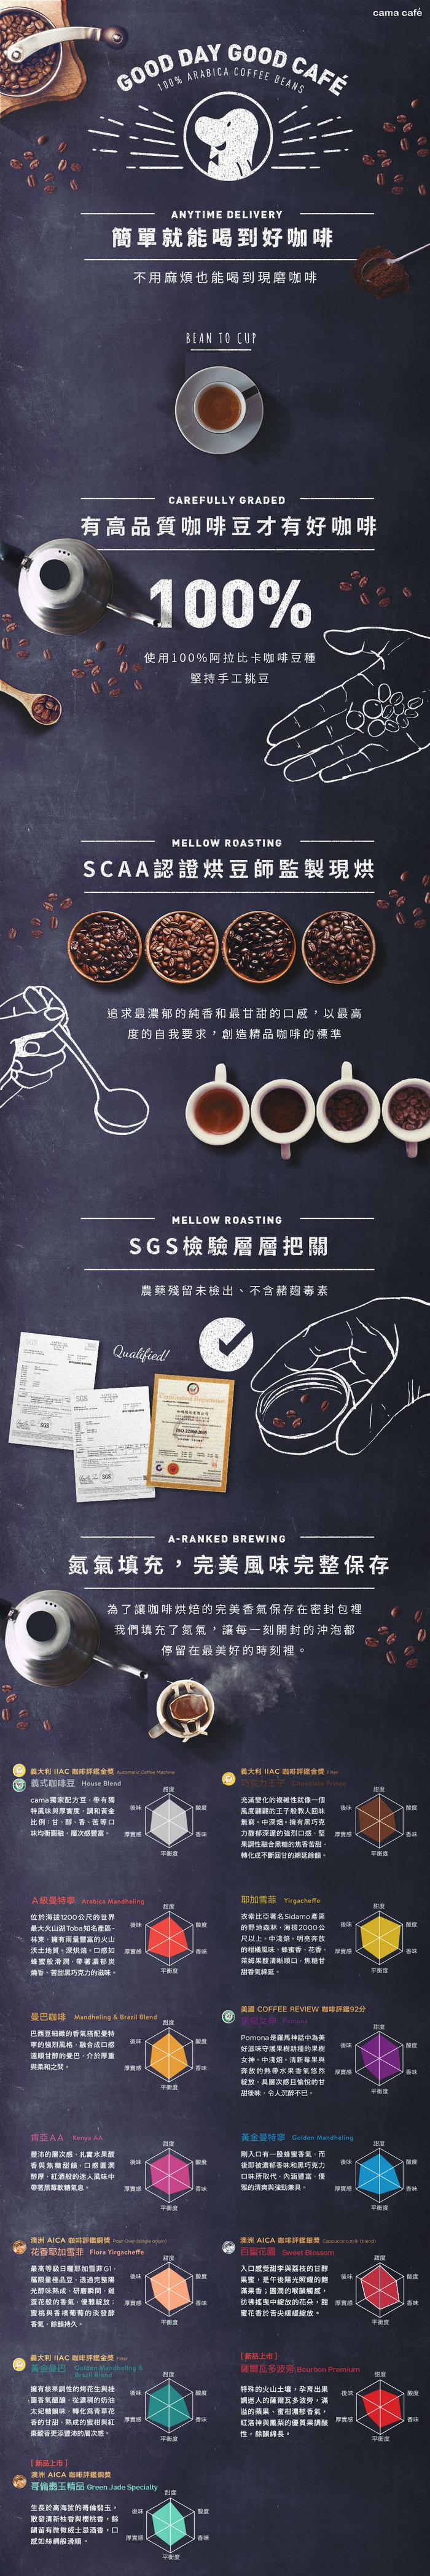 cama cafe 耶加雪菲咖啡豆(250g/1包)